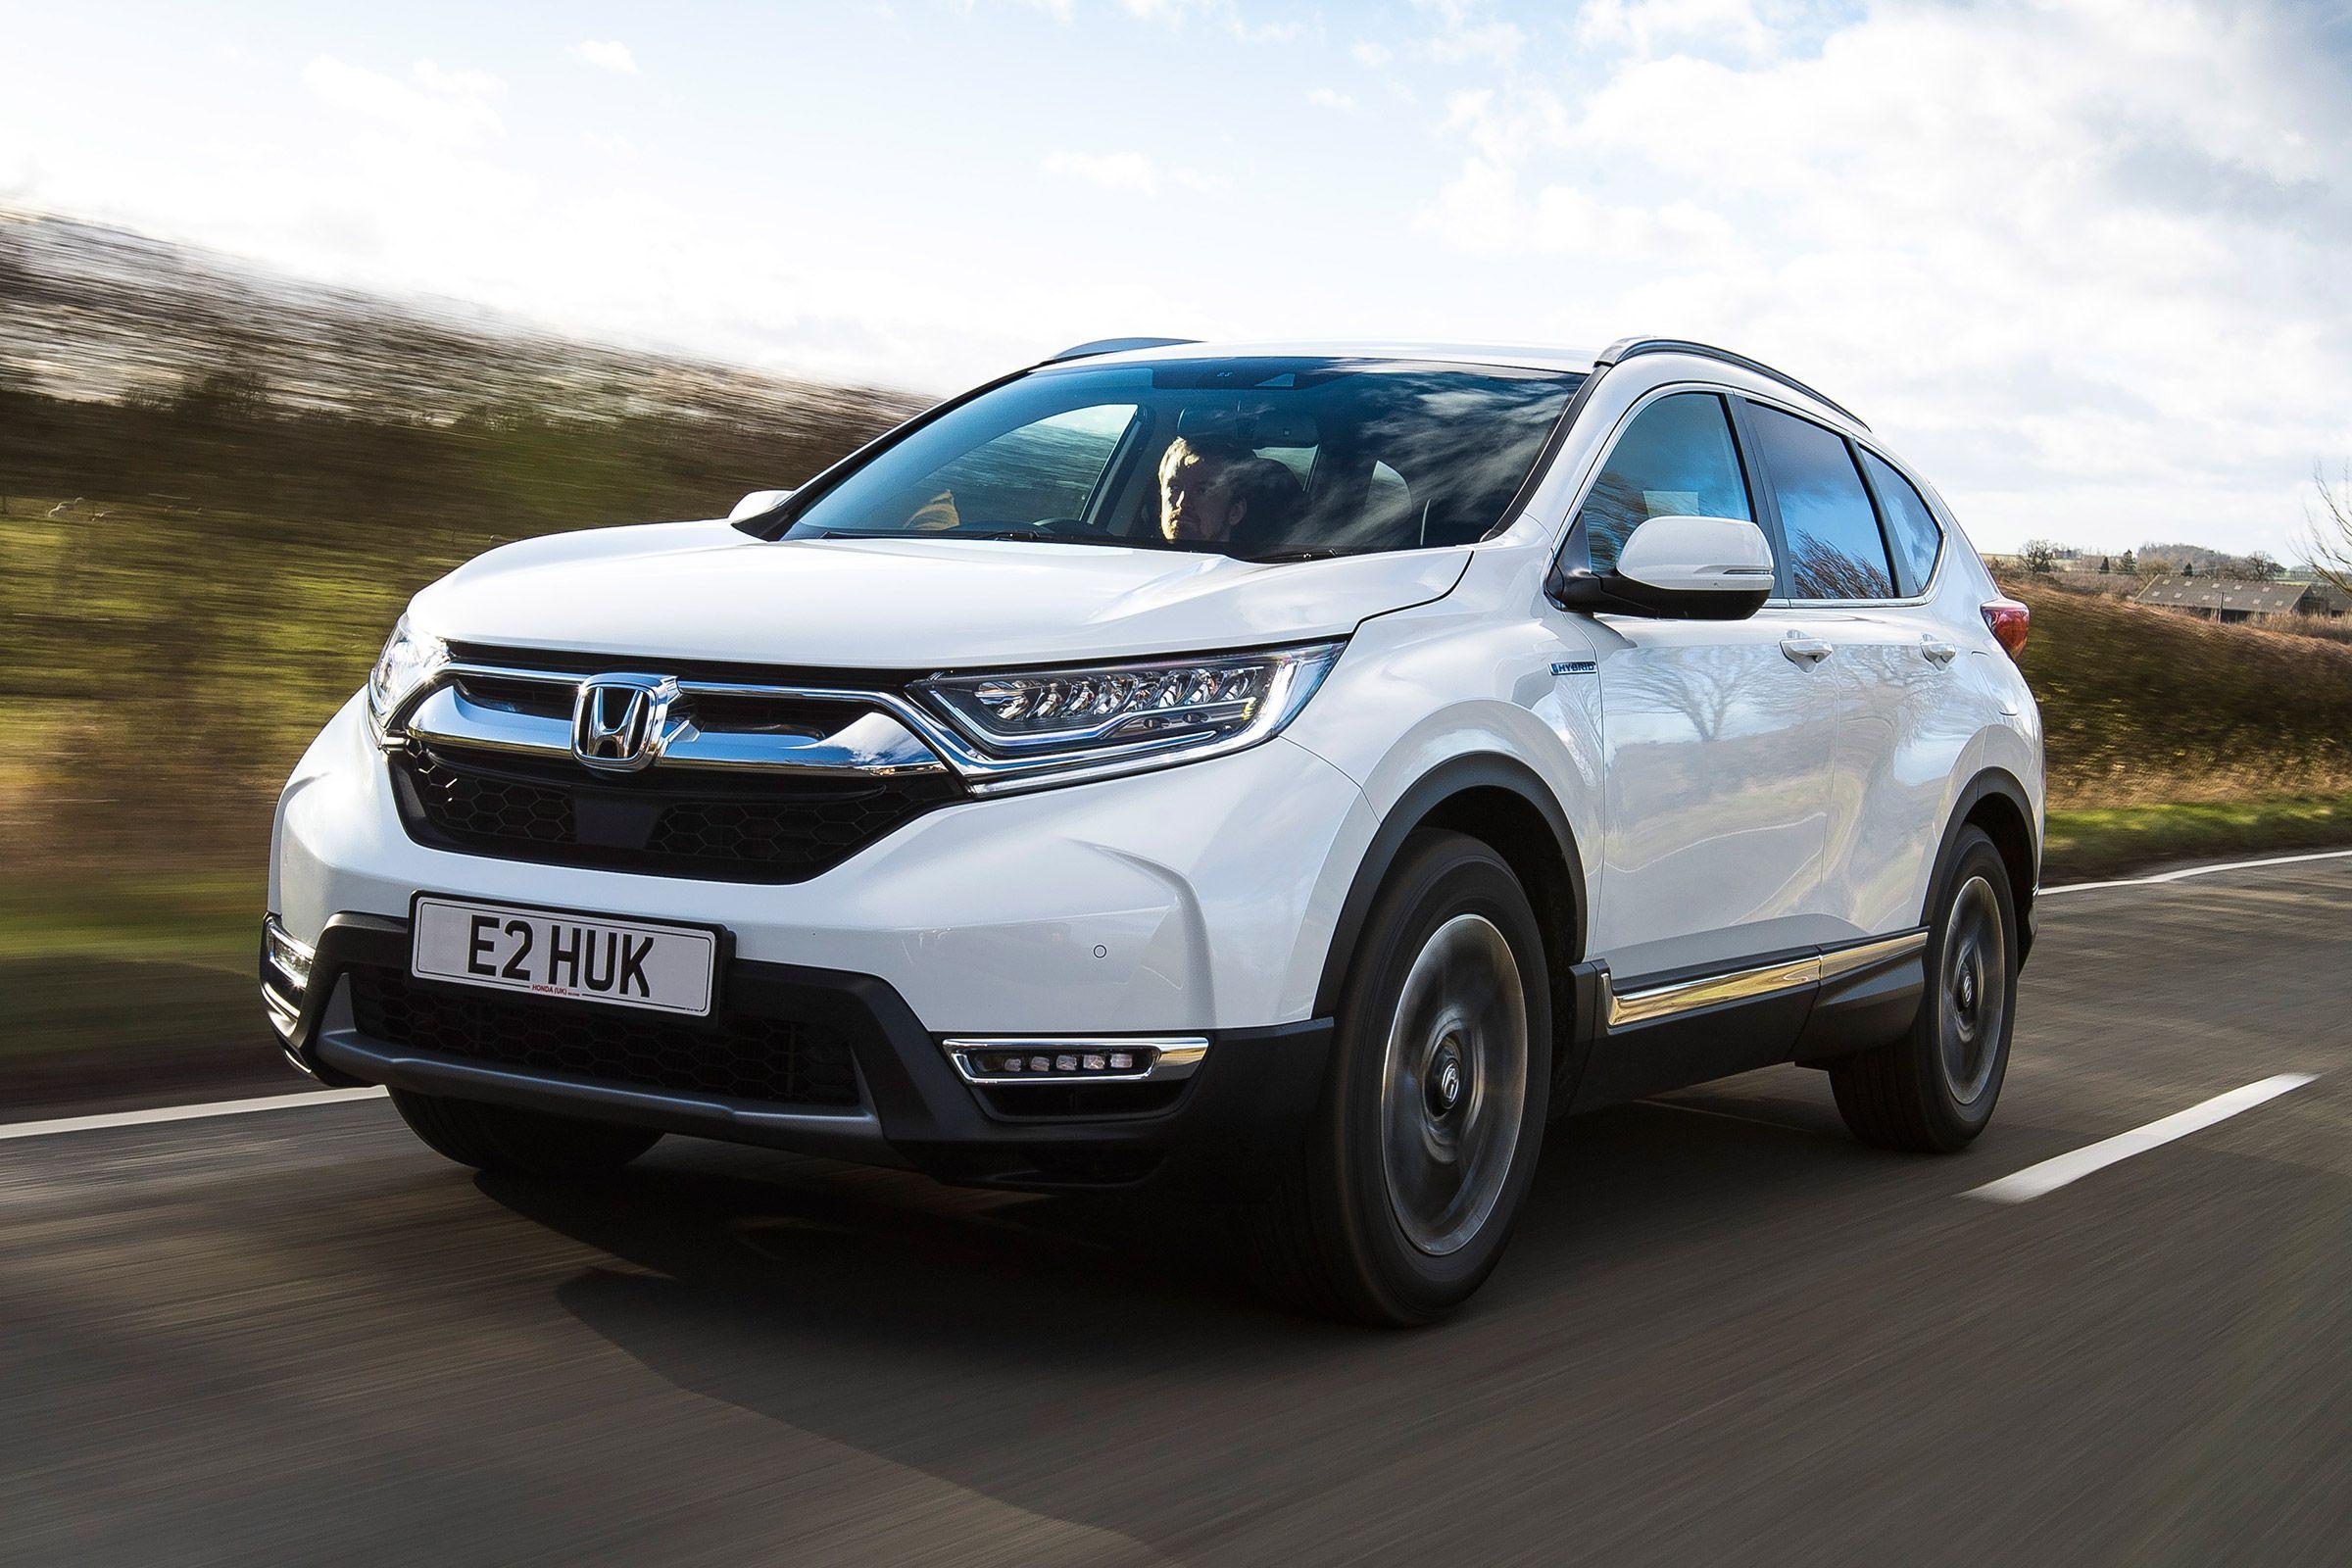 Car Industry Latest News Updates Autodeals Pk In 2020 Small Suv Cars Honda Cr Honda Crv